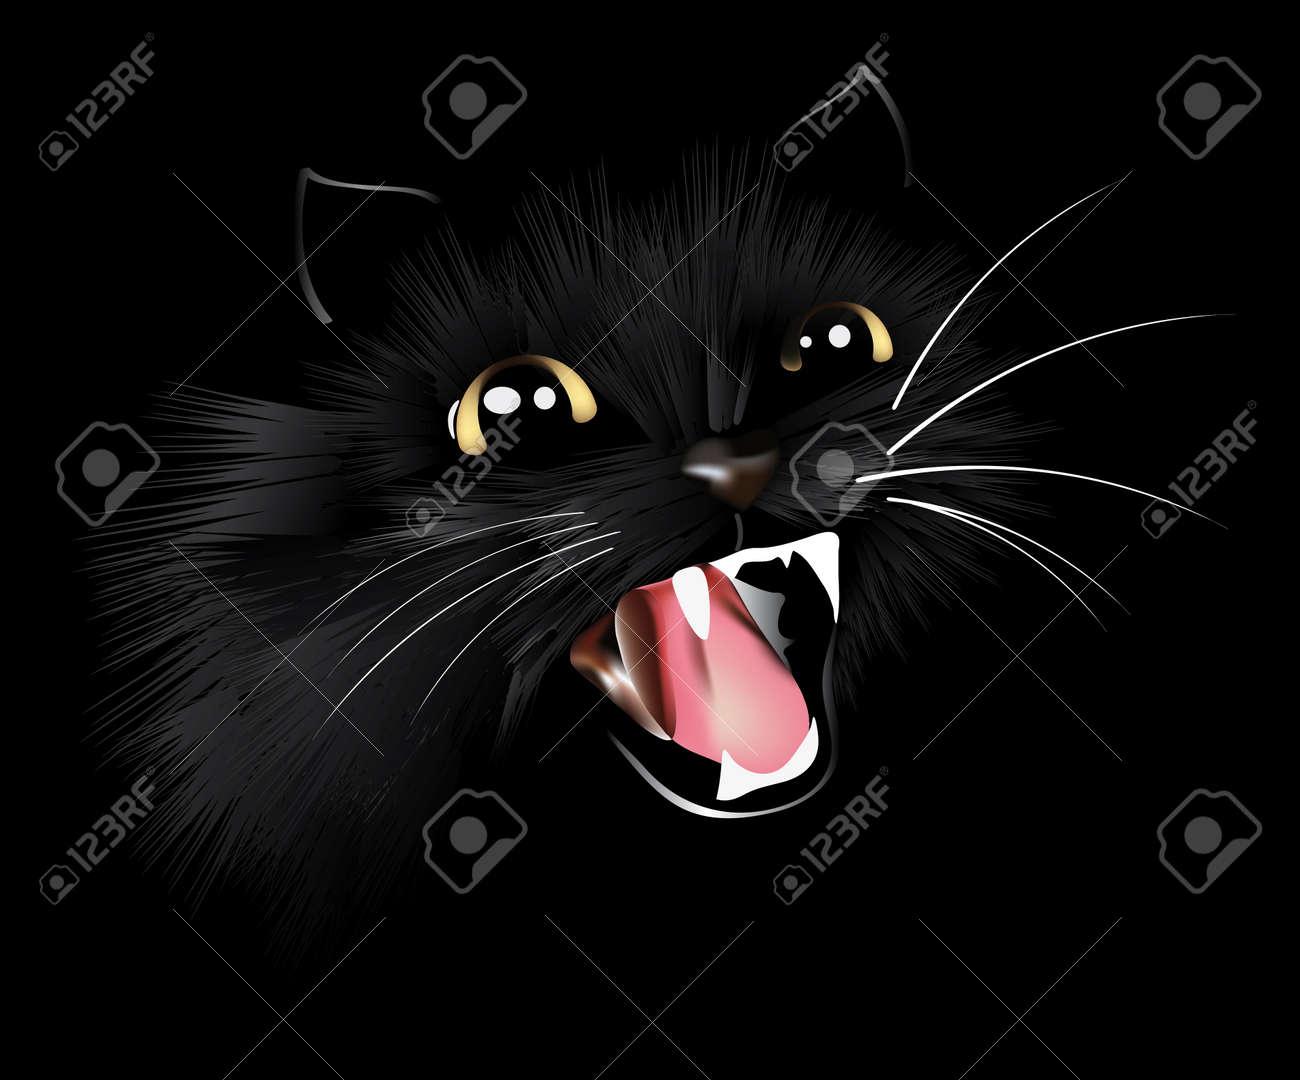 Evil Black Cat, Halloween Background, Vector Illustration Royalty ...